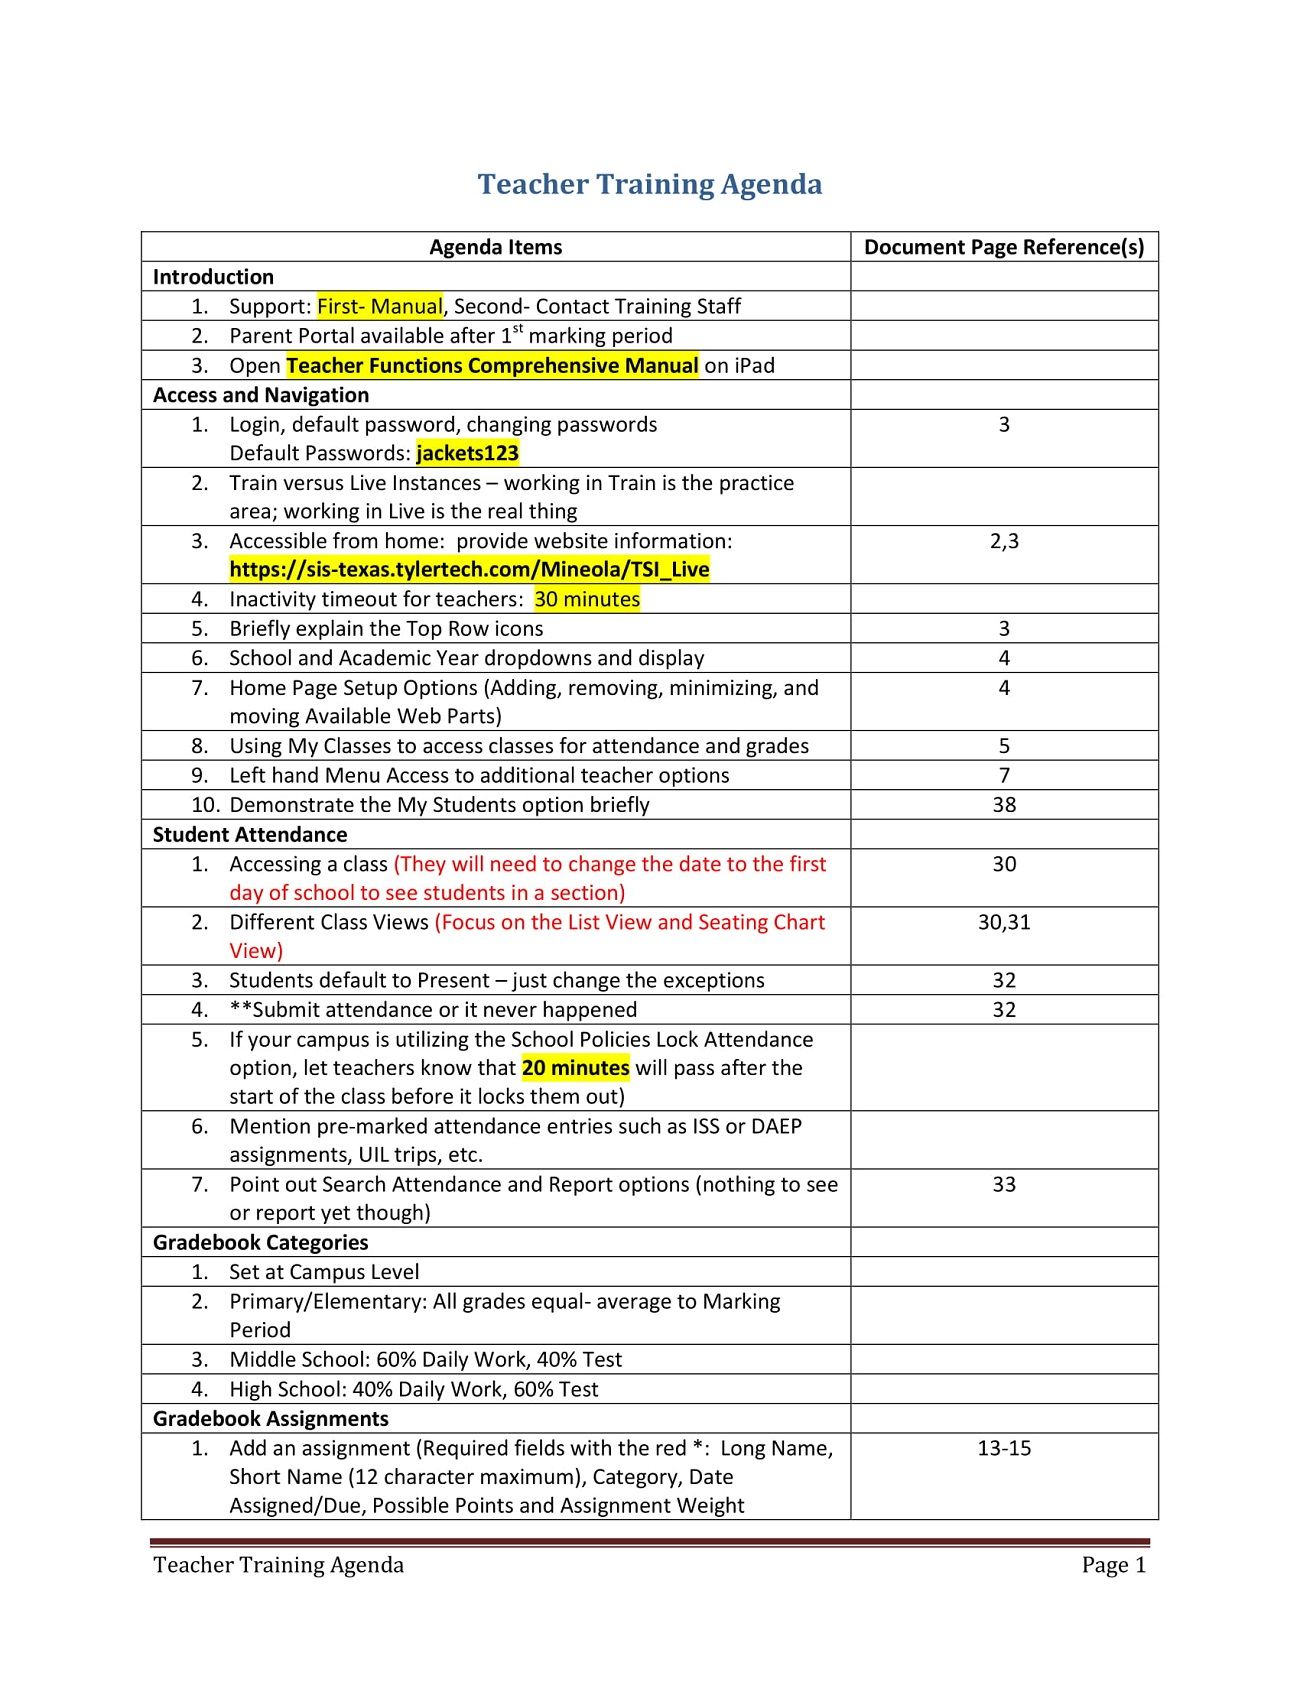 Teacher Training Agenda PDF Template Sample Microsoft Word Ppt How To Create A Pdf Layout  Full